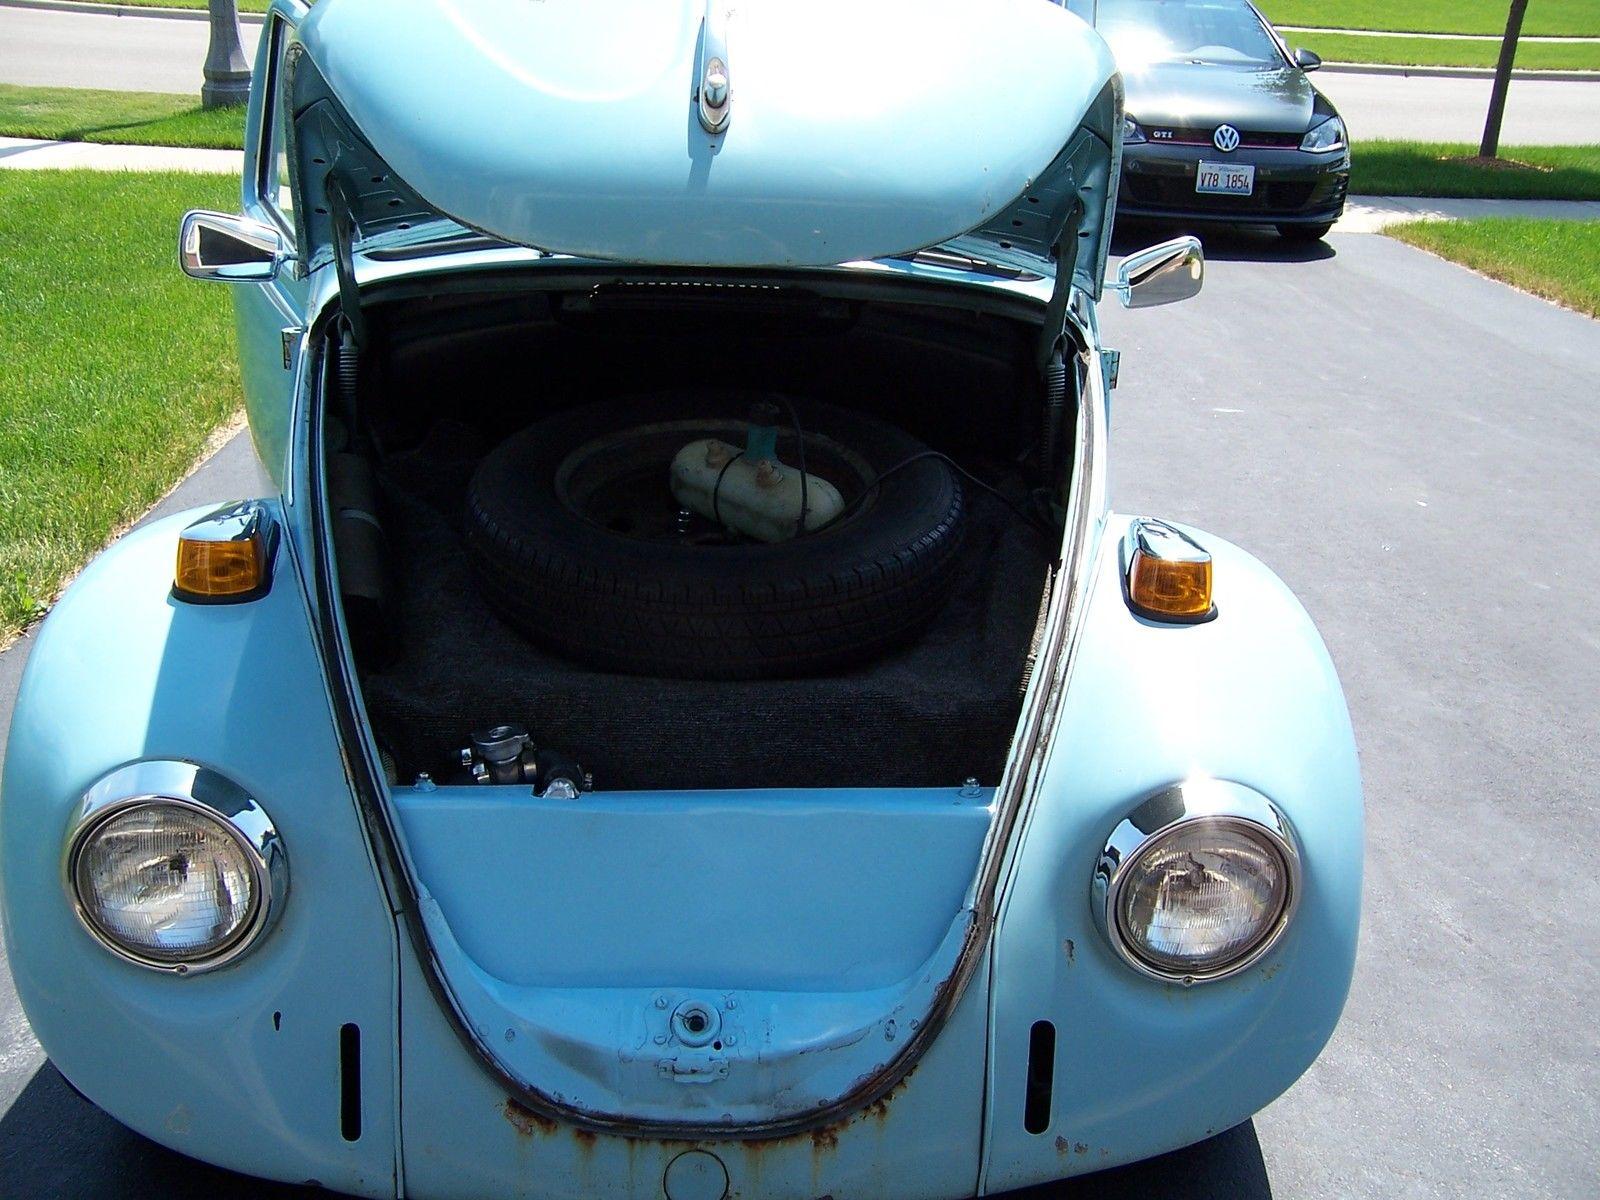 1971 Beetle With A Subaru Ej20 Engine Swap Depot Johnson 50 Hp Wiring Harness